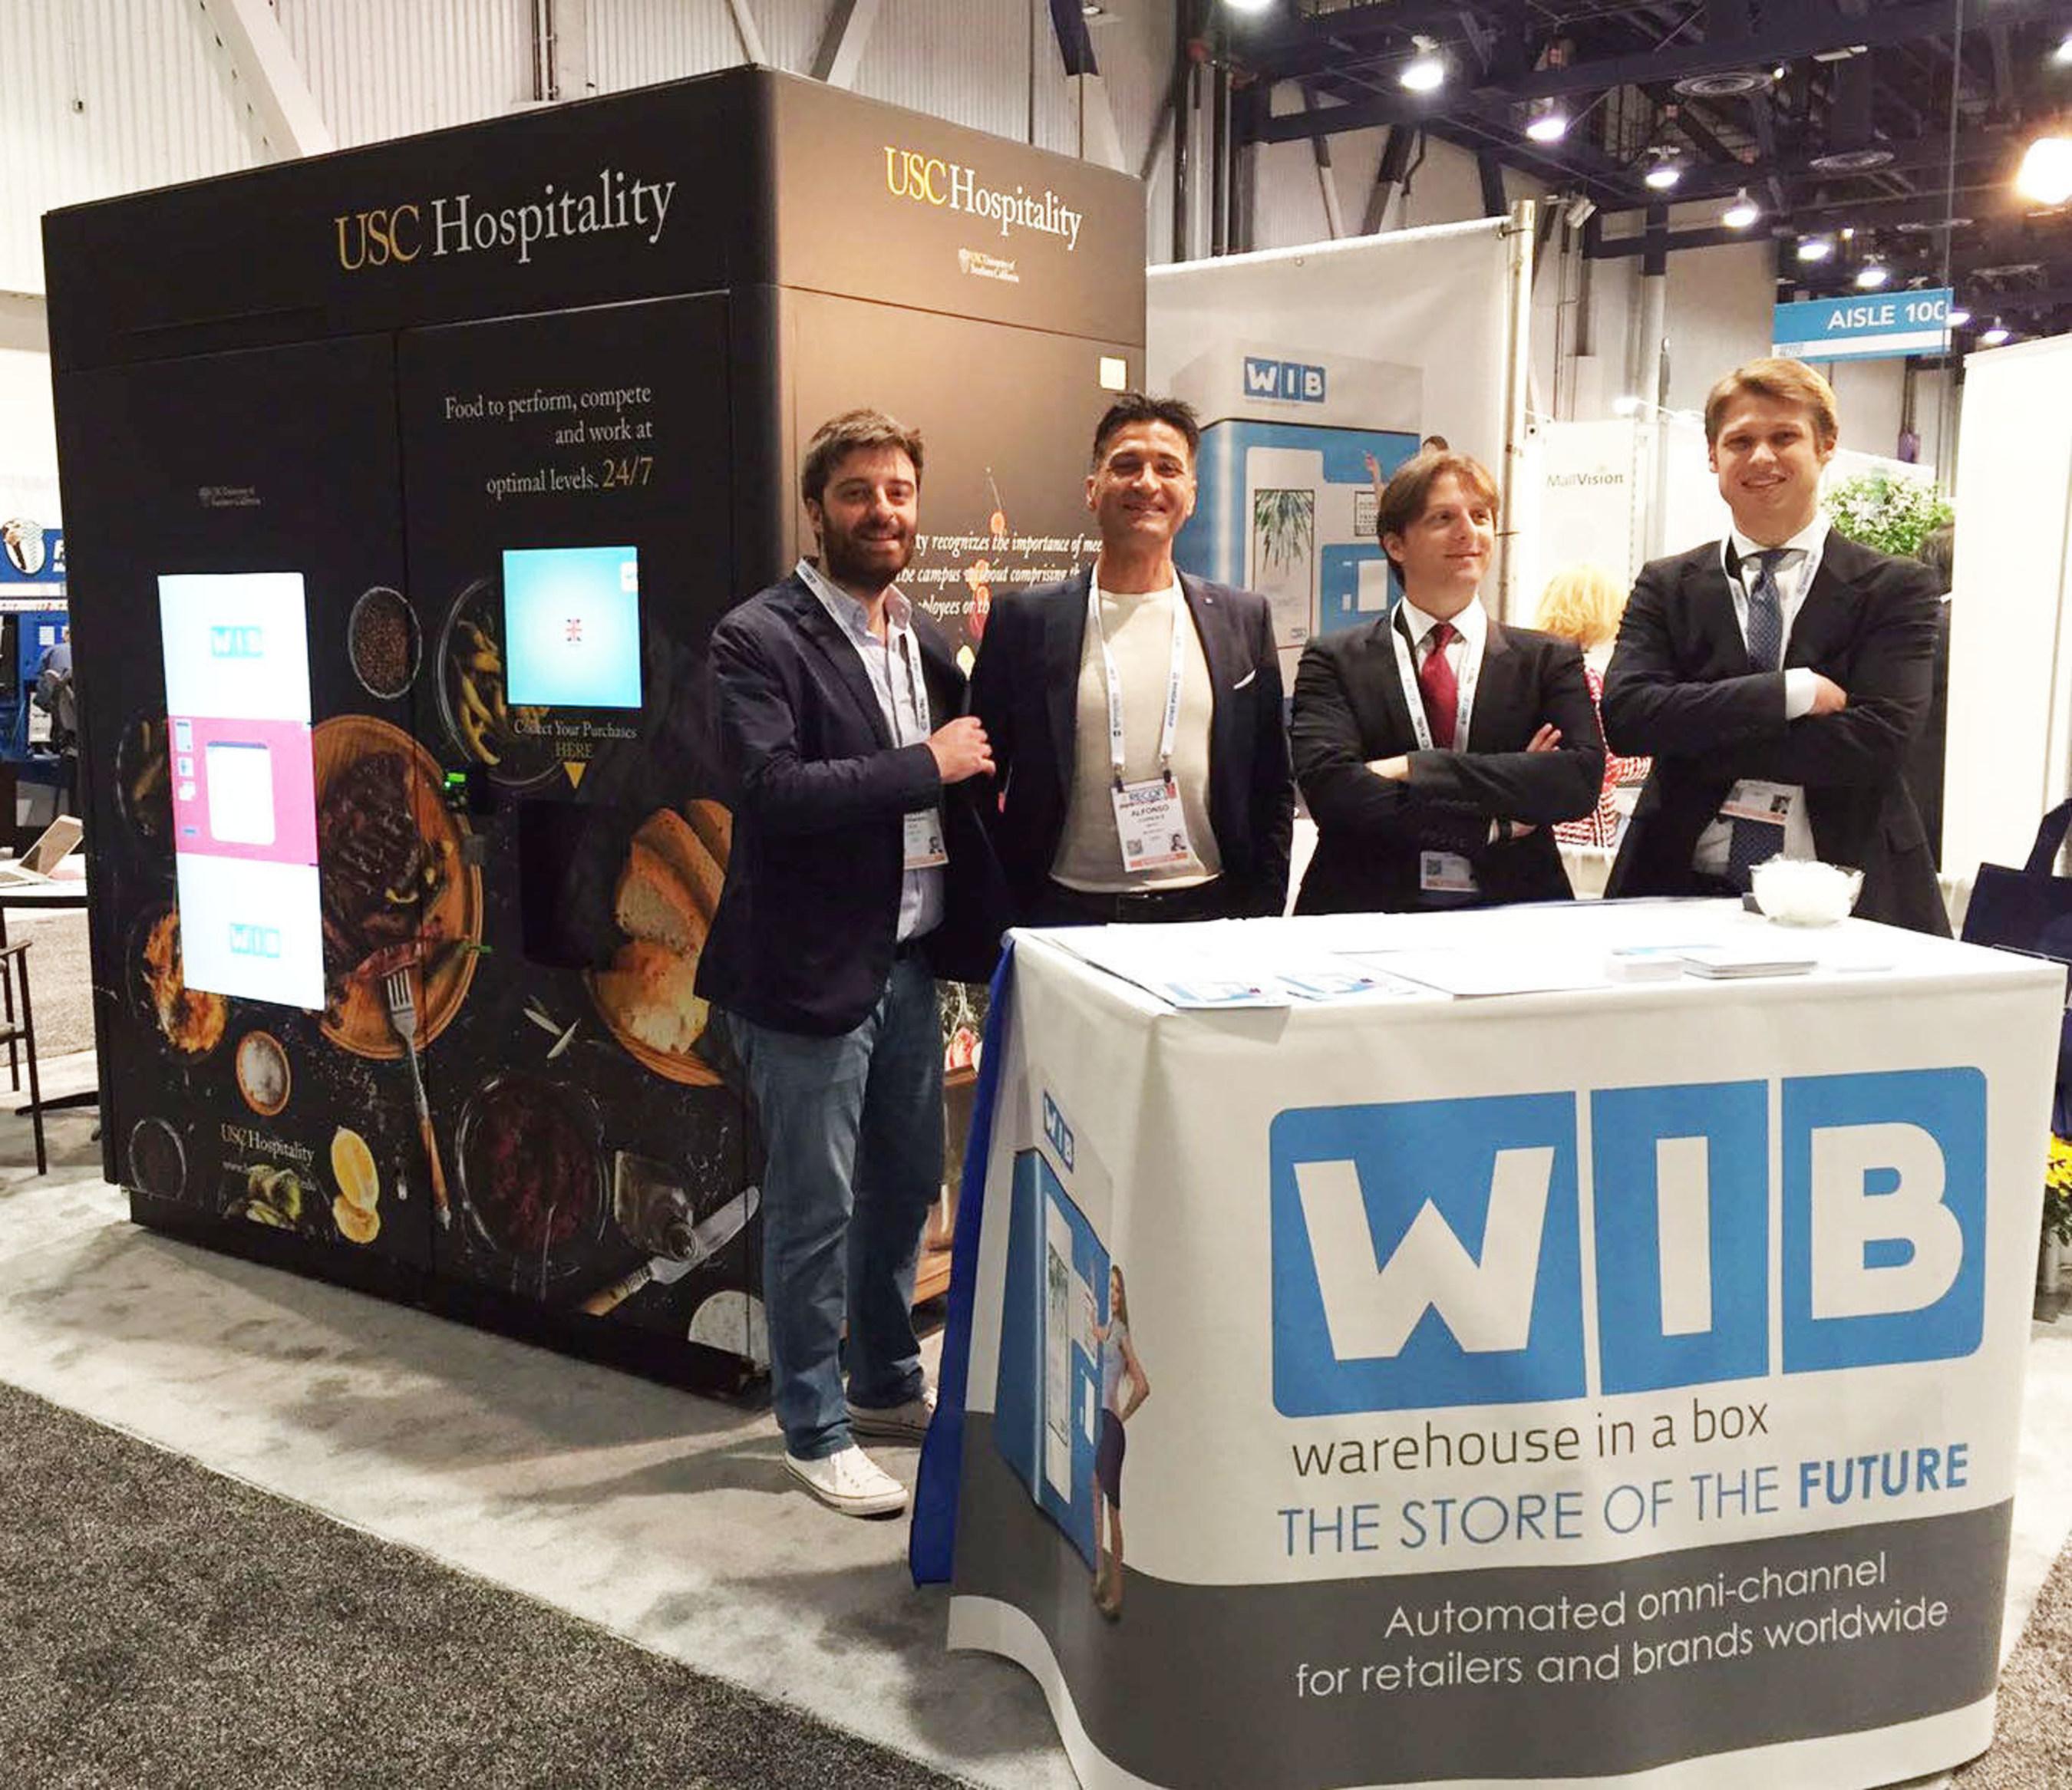 WIB presents revolutionary retail solution at SPREE RECon